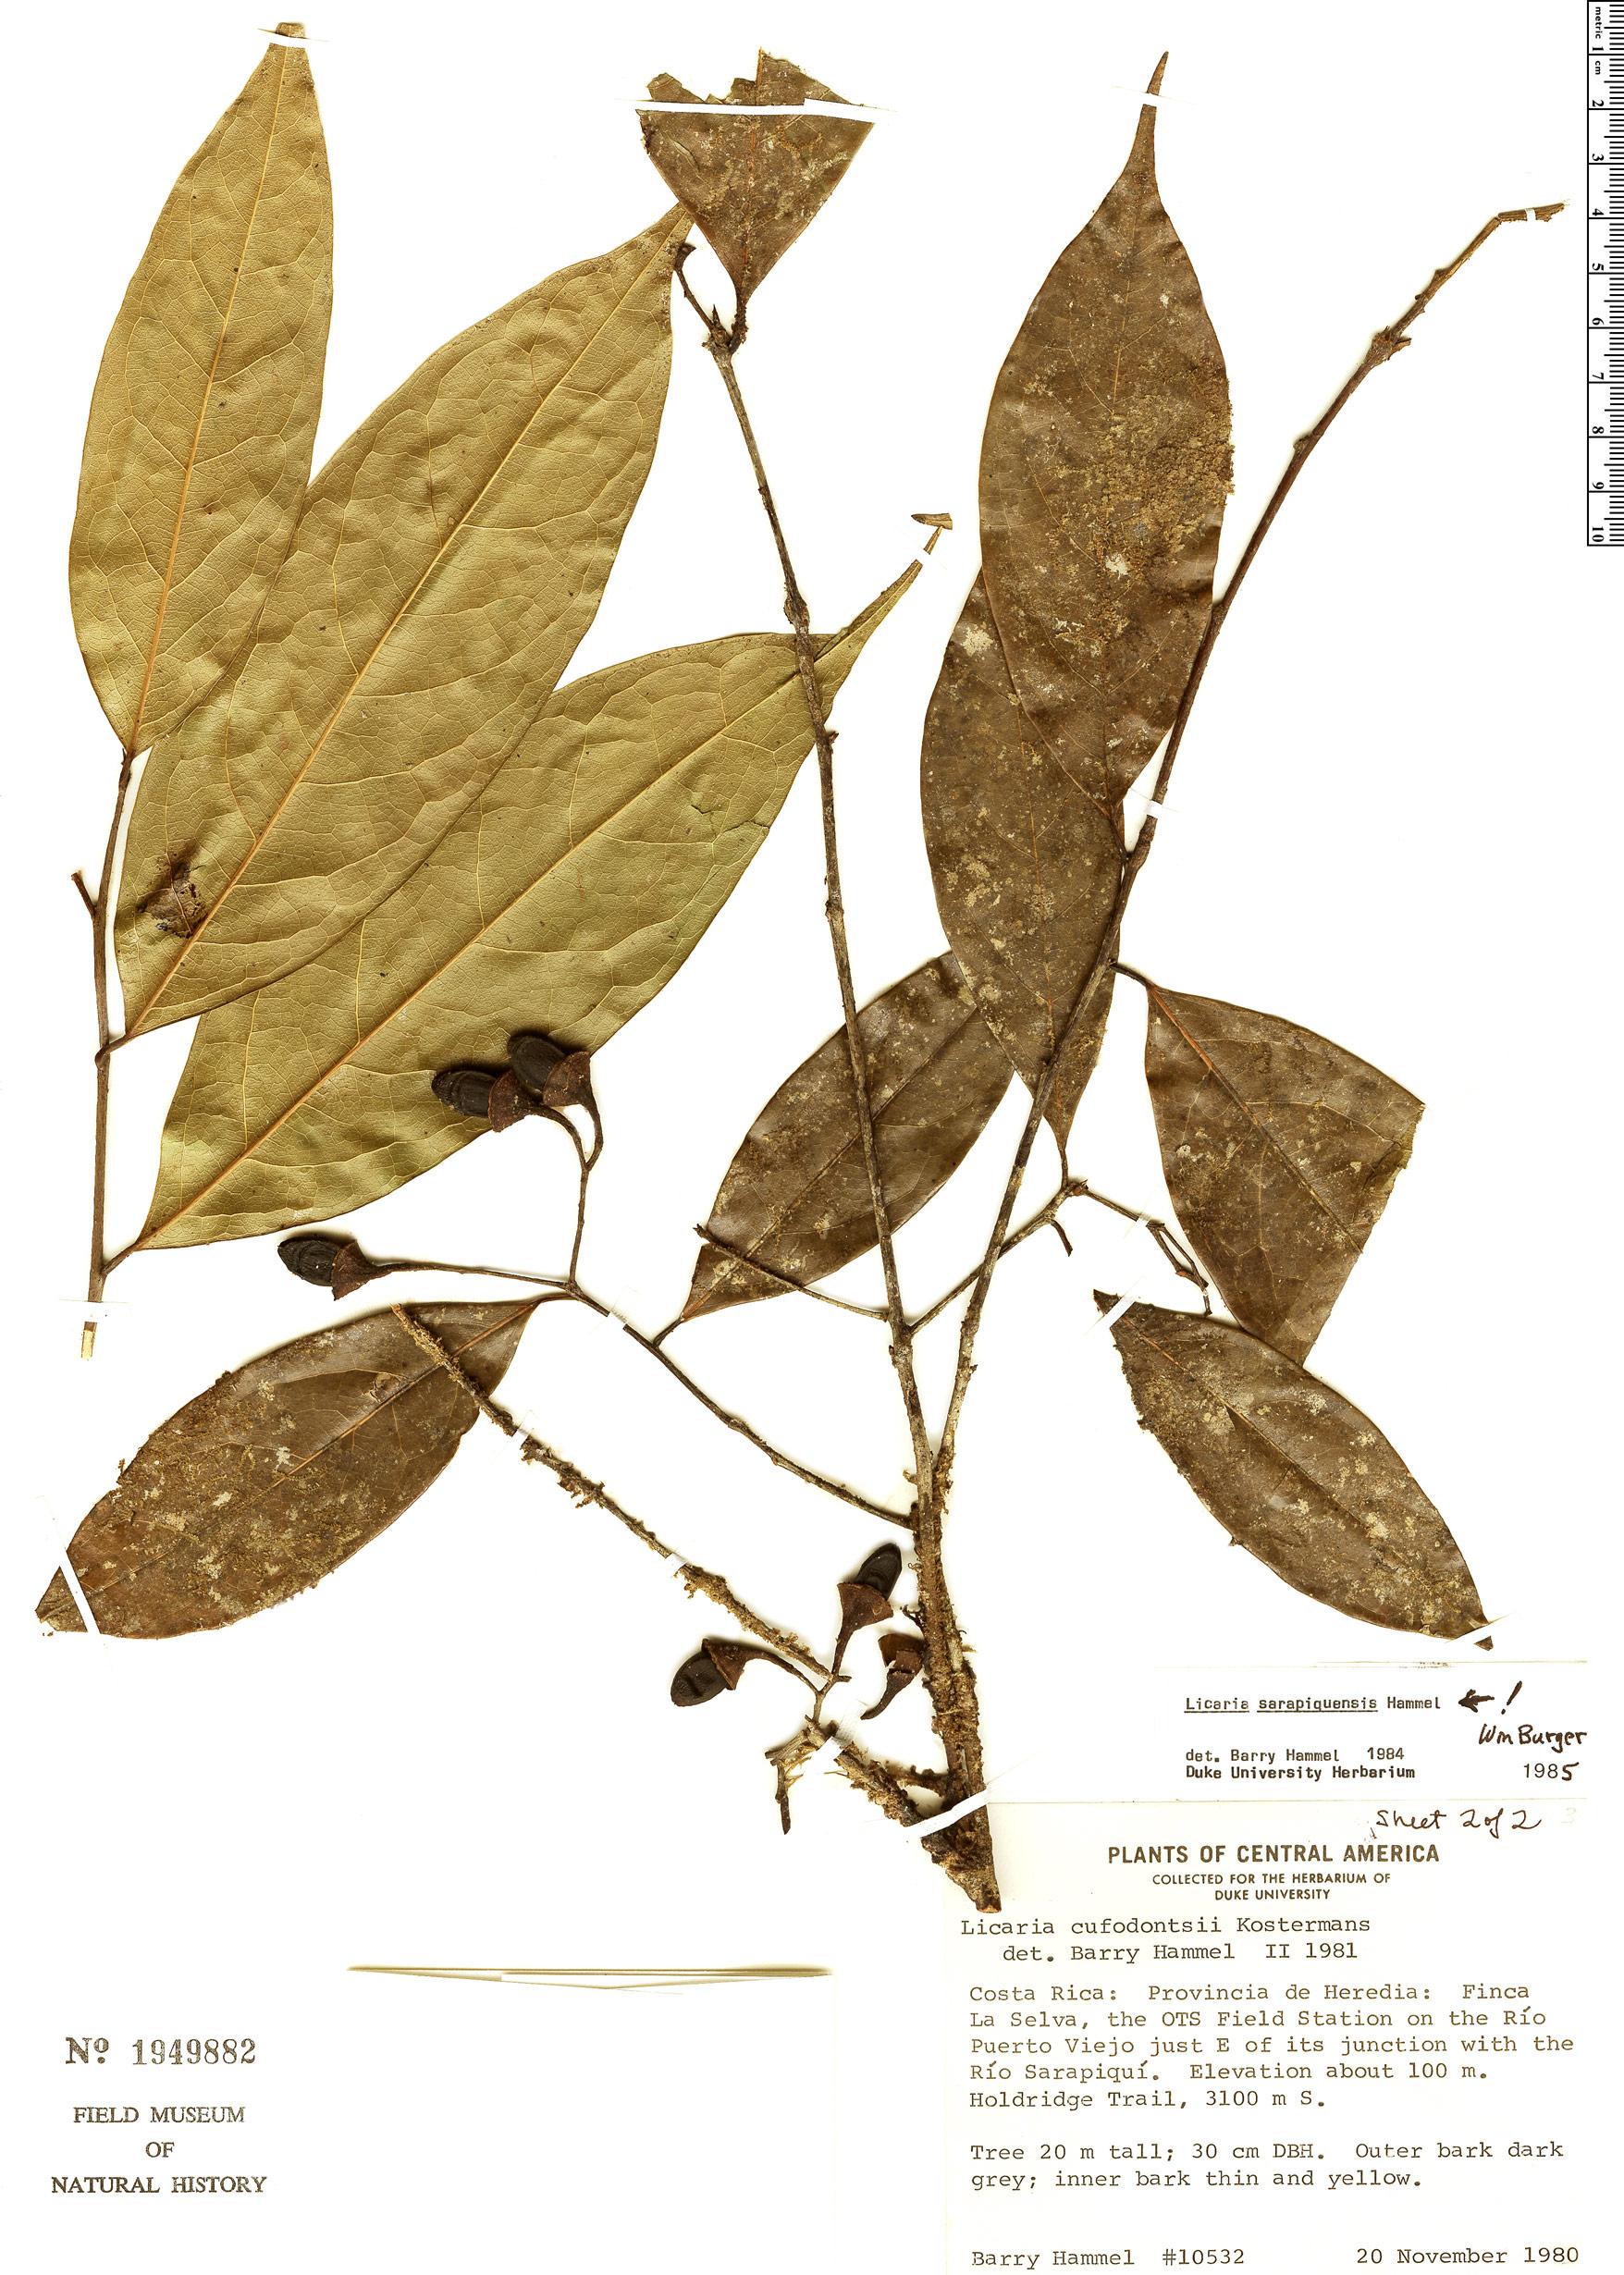 Specimen: Licaria sarapiquensis